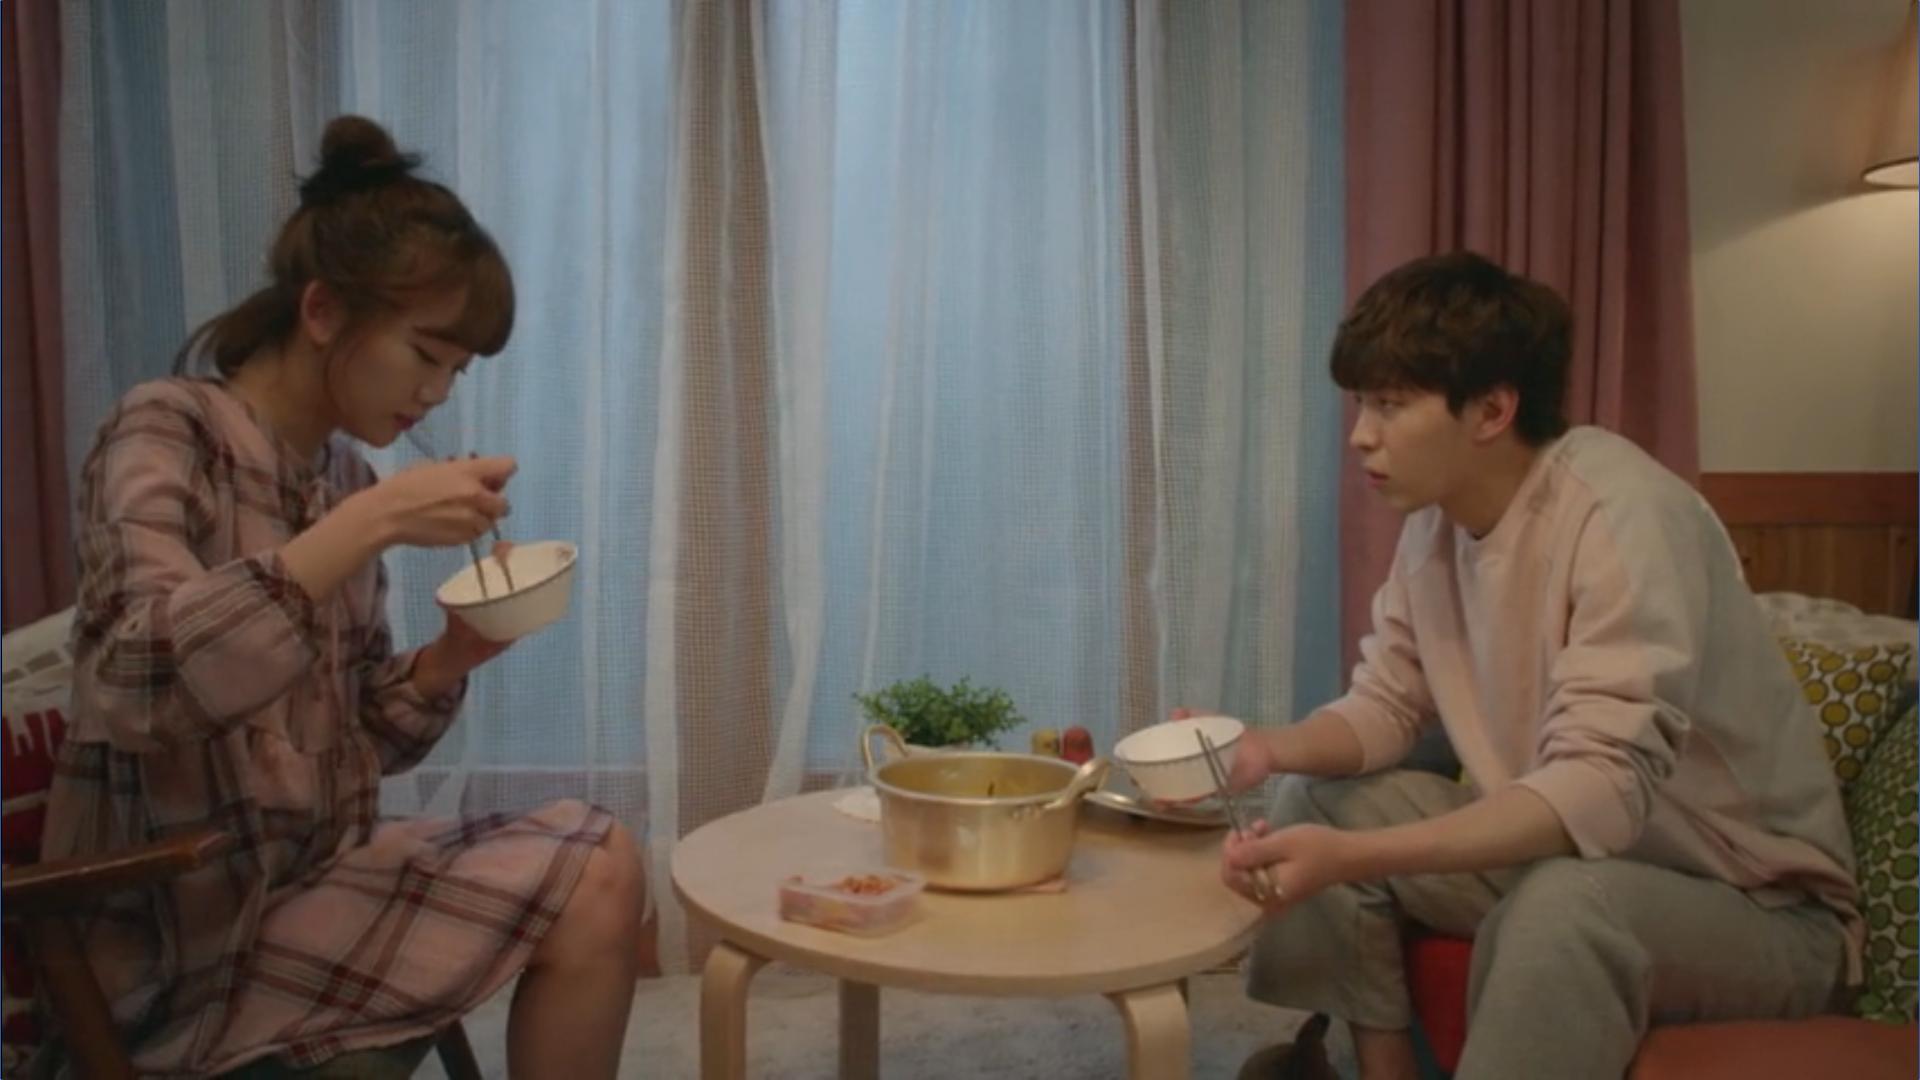 Wednesday 3:30 PM Seon Eun-woo and Yoon Jae-won having ramen